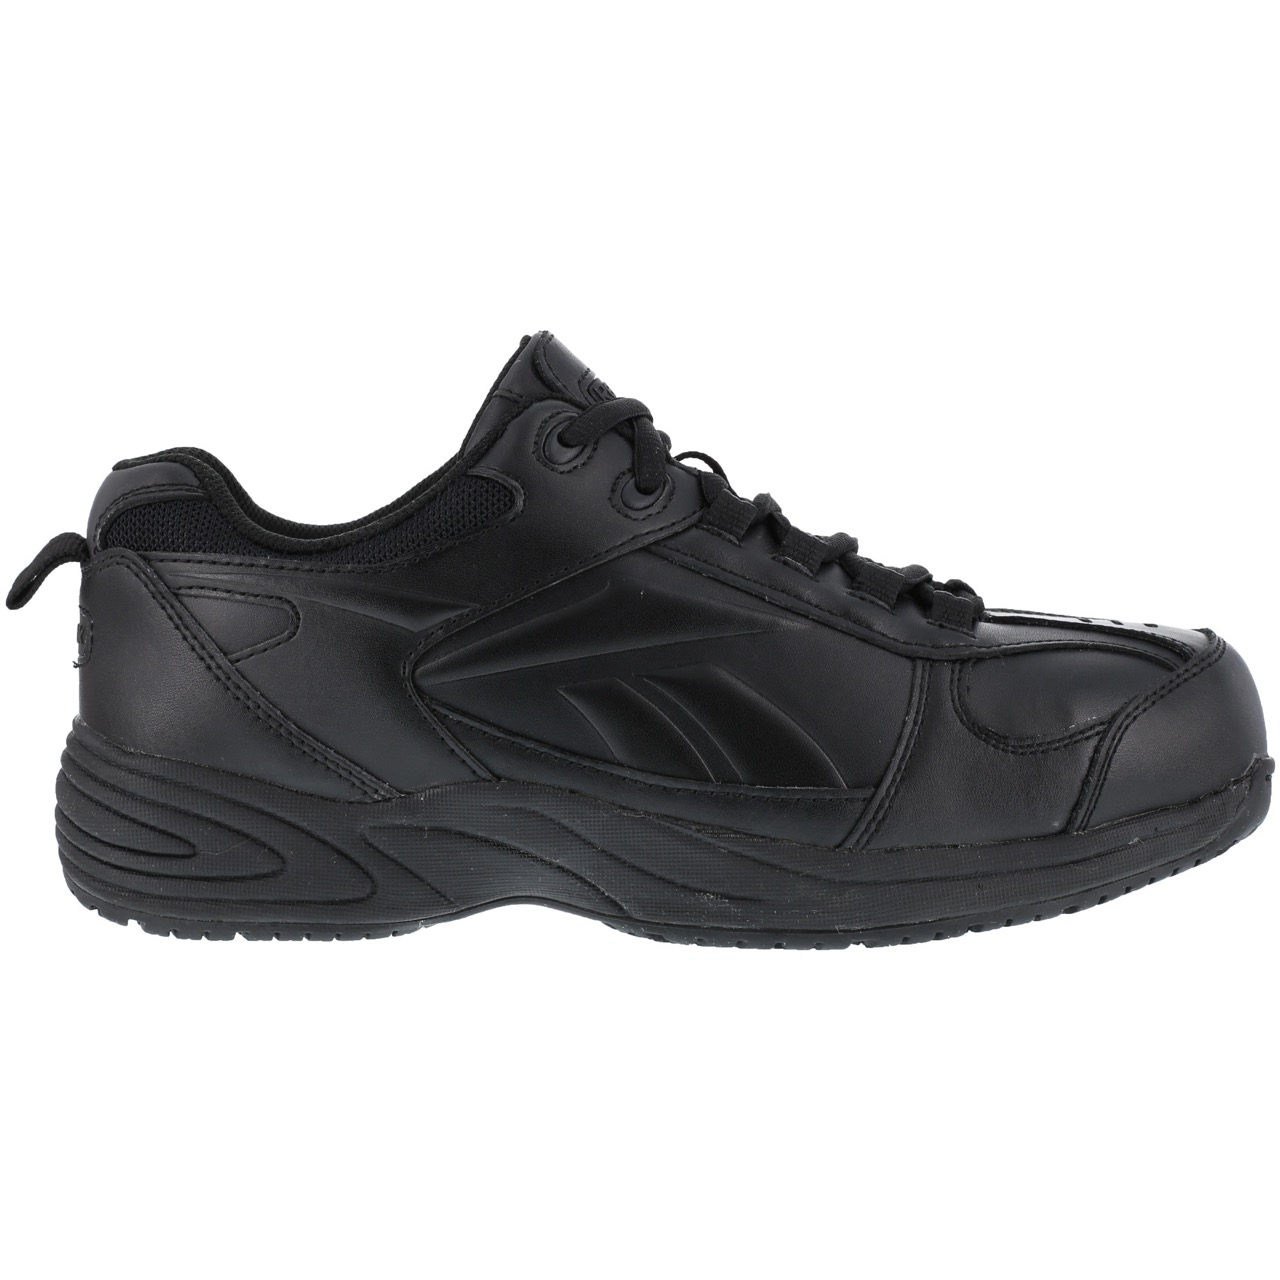 Reebok Street Jogger Comp Toe Rb1860